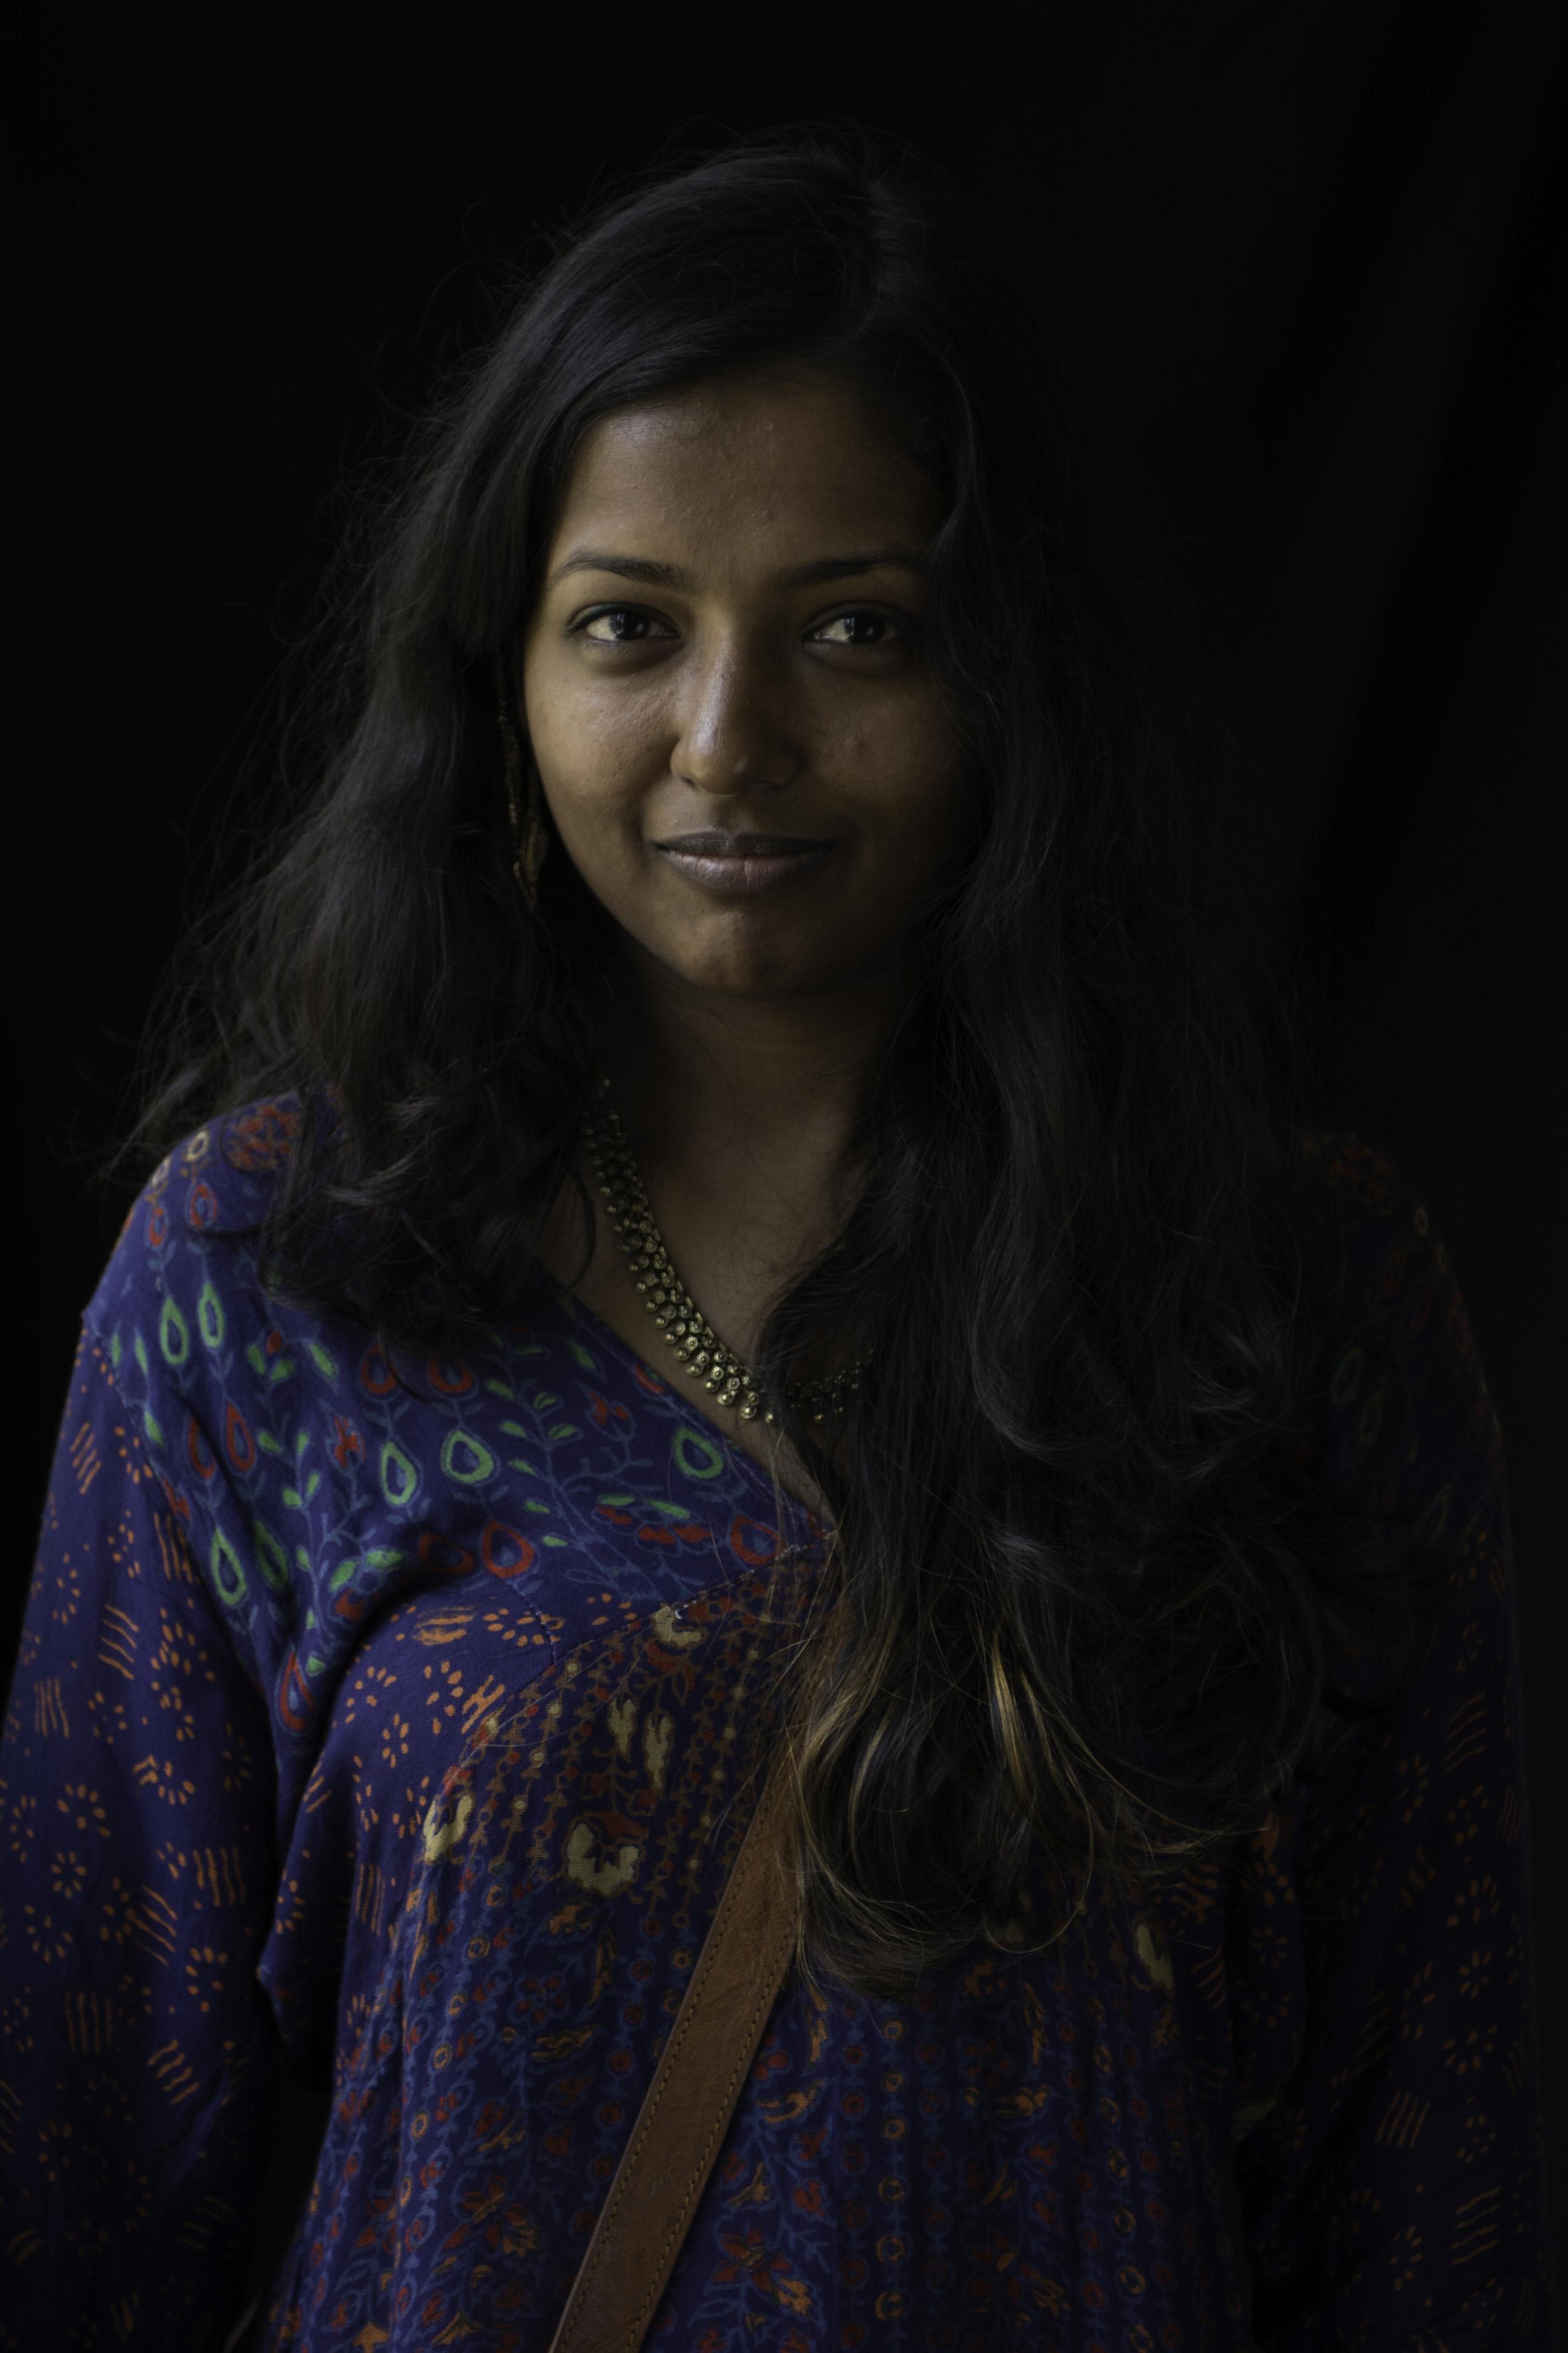 046 Khyati, from Dehra Dun, Uttarakhand, India